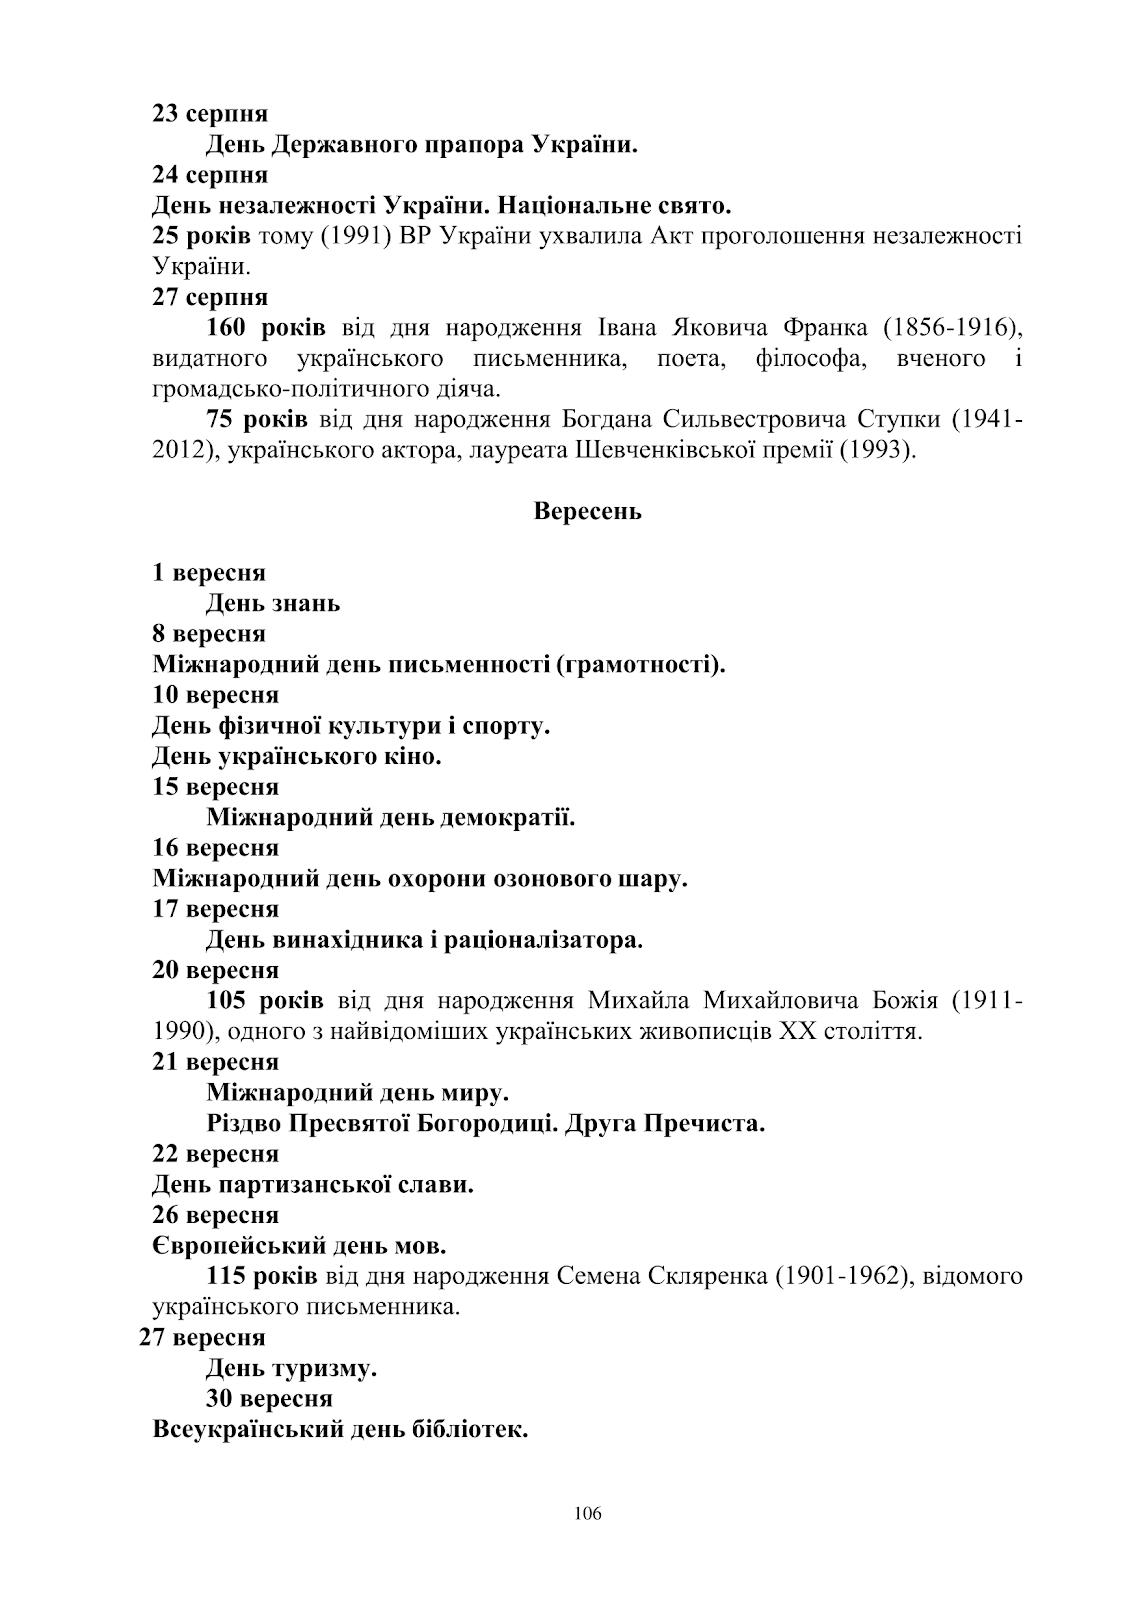 C:\Users\Валерия\Desktop\план 2016 рік\план 2016 рік-106.png